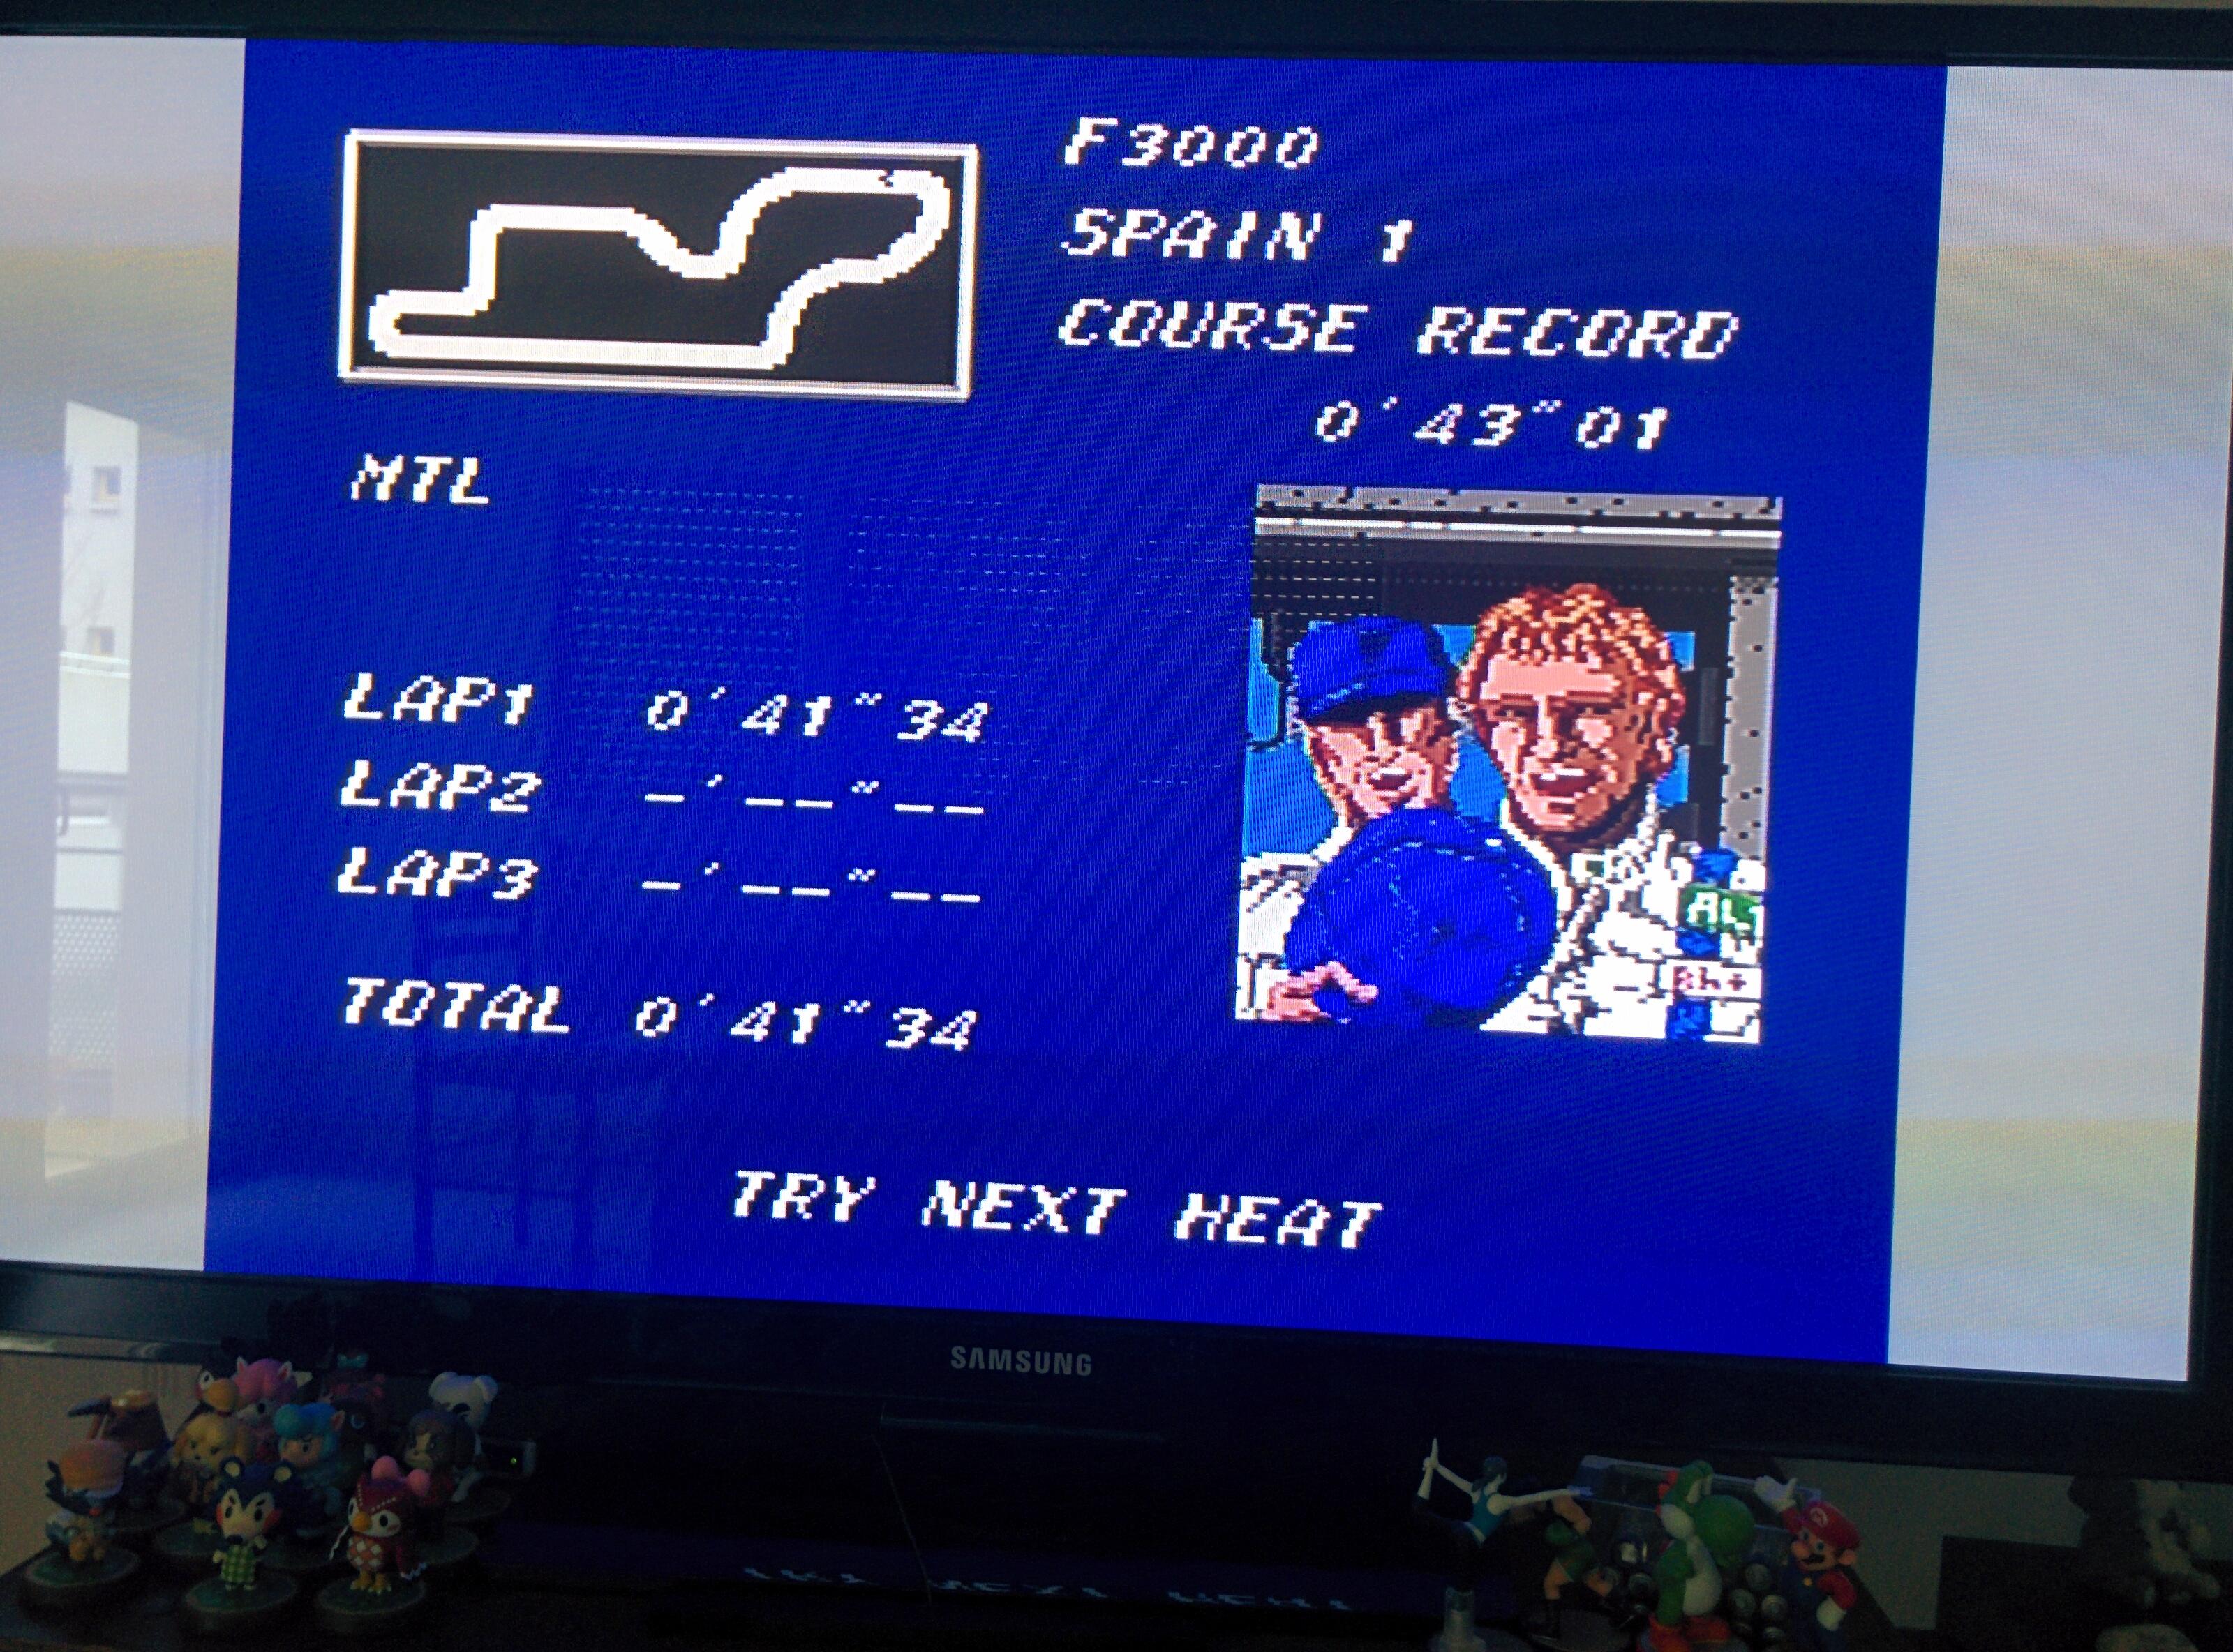 Final Lap Twin [Test/ 1 Lap/ F3000/ Spain 1] time of 0:00:41.34